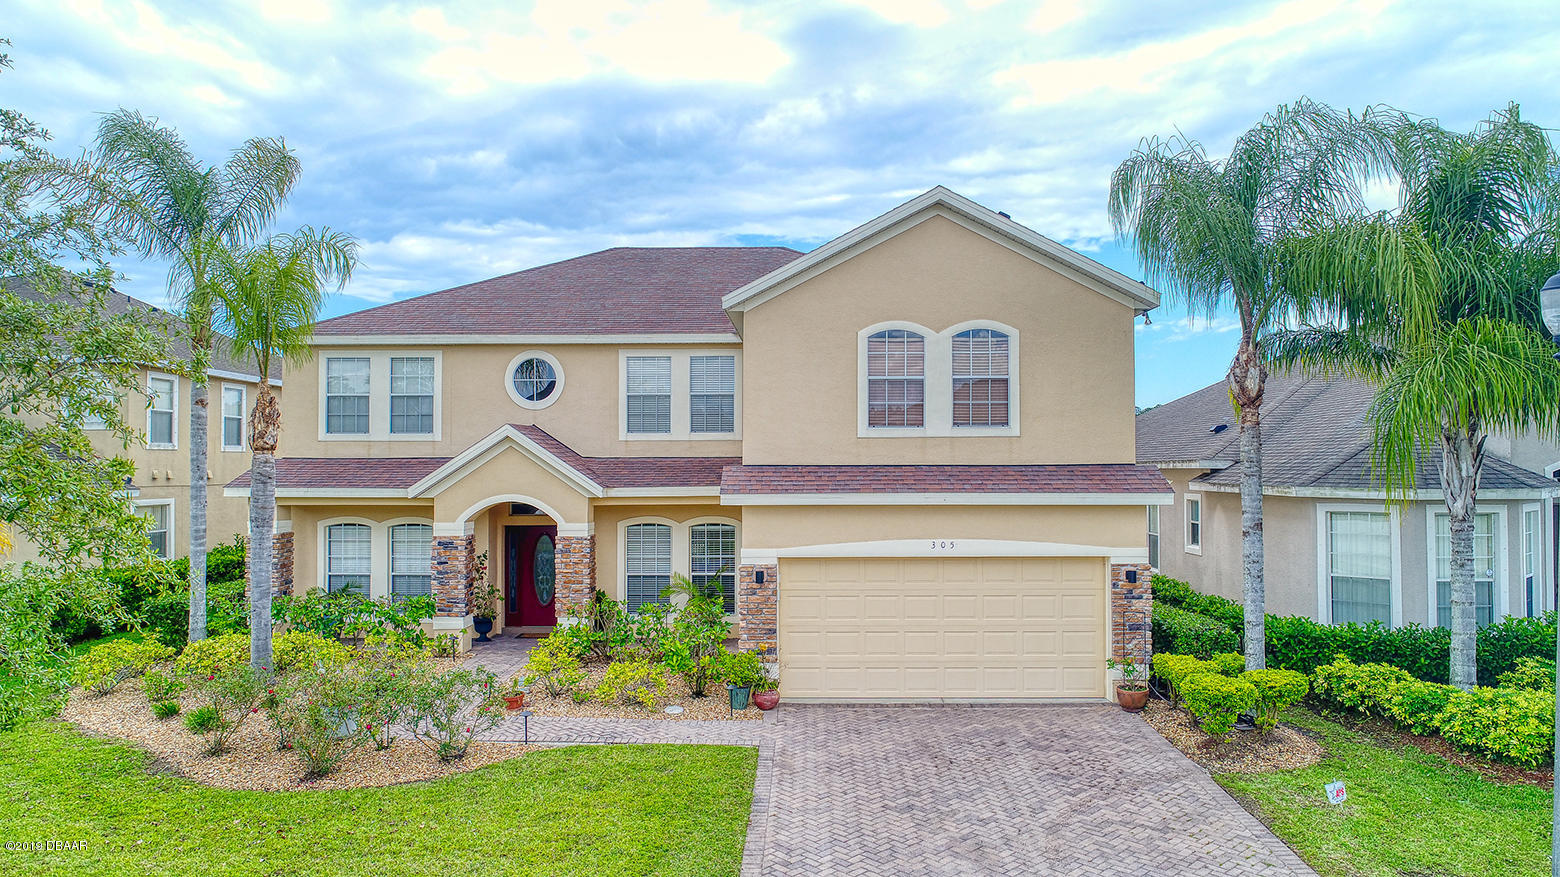 305 Wentworth Avenue, South Daytona, Florida